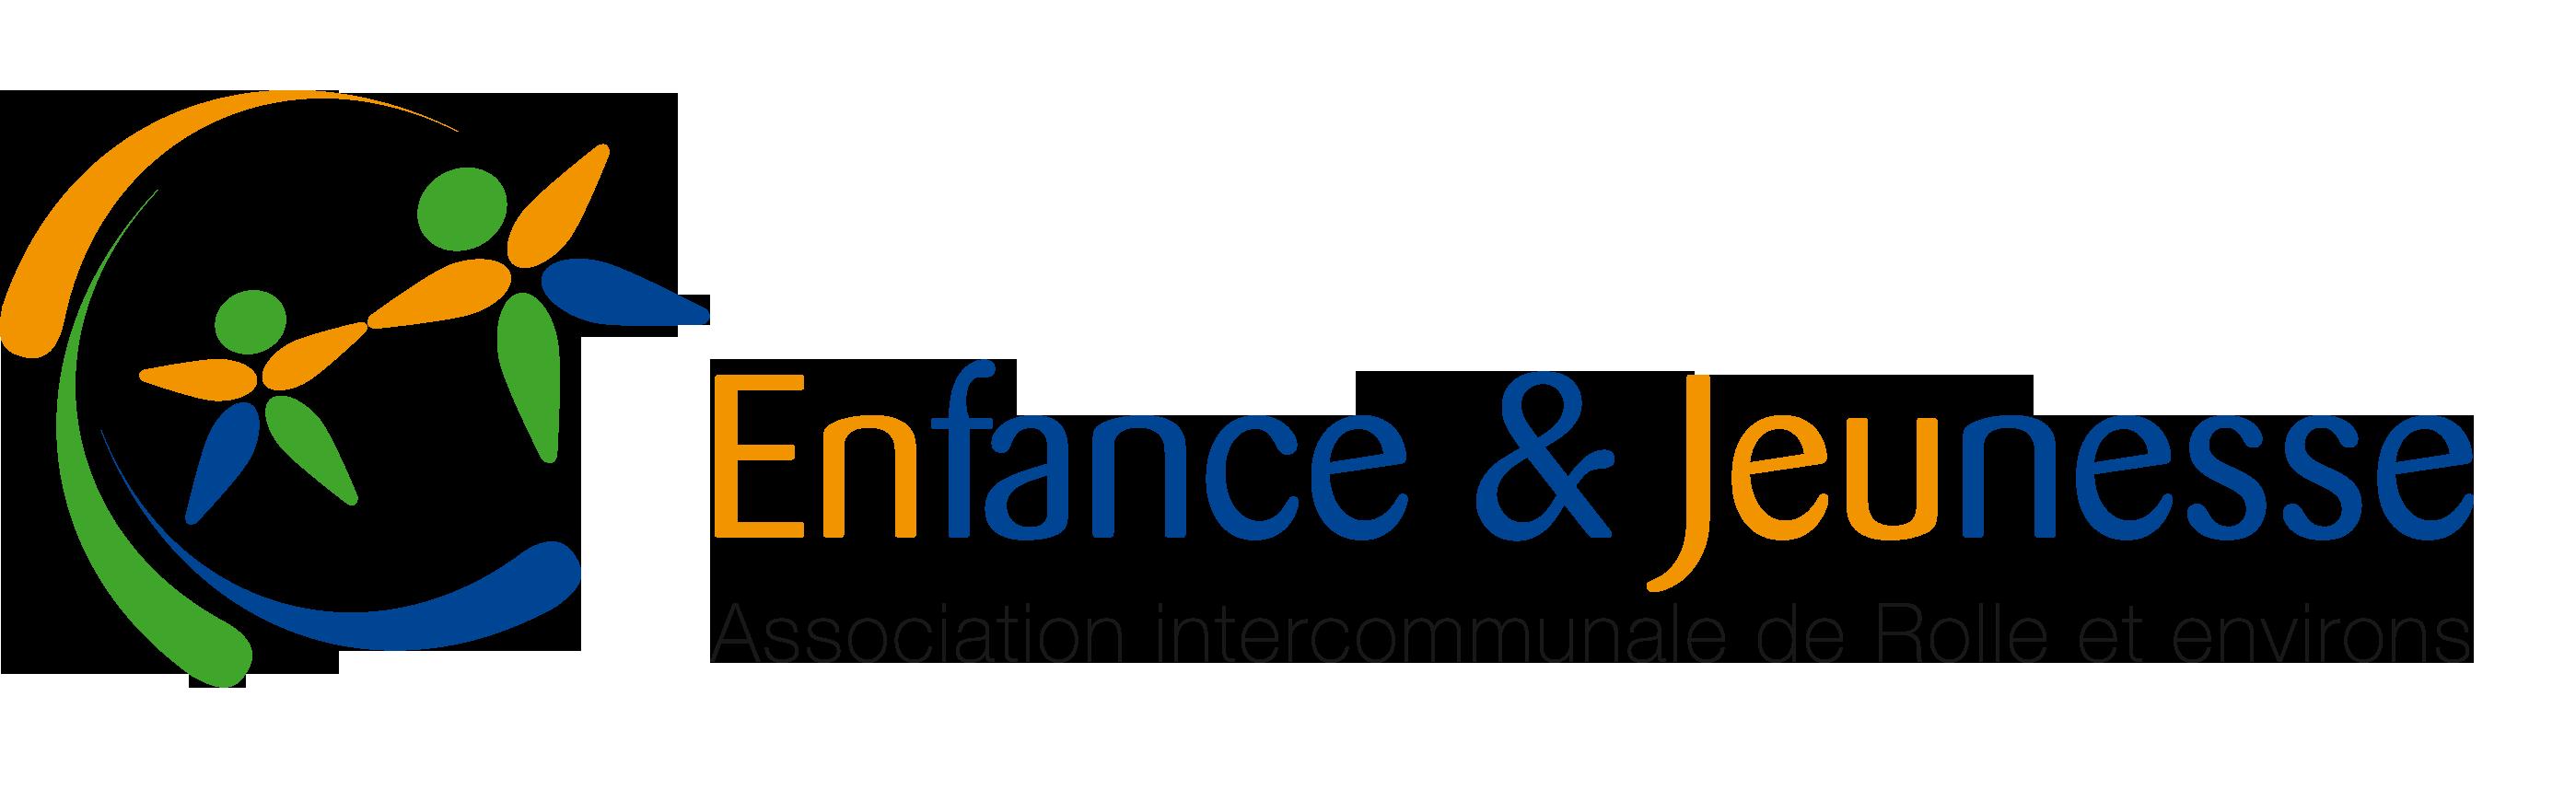 Partenaire institutionnel